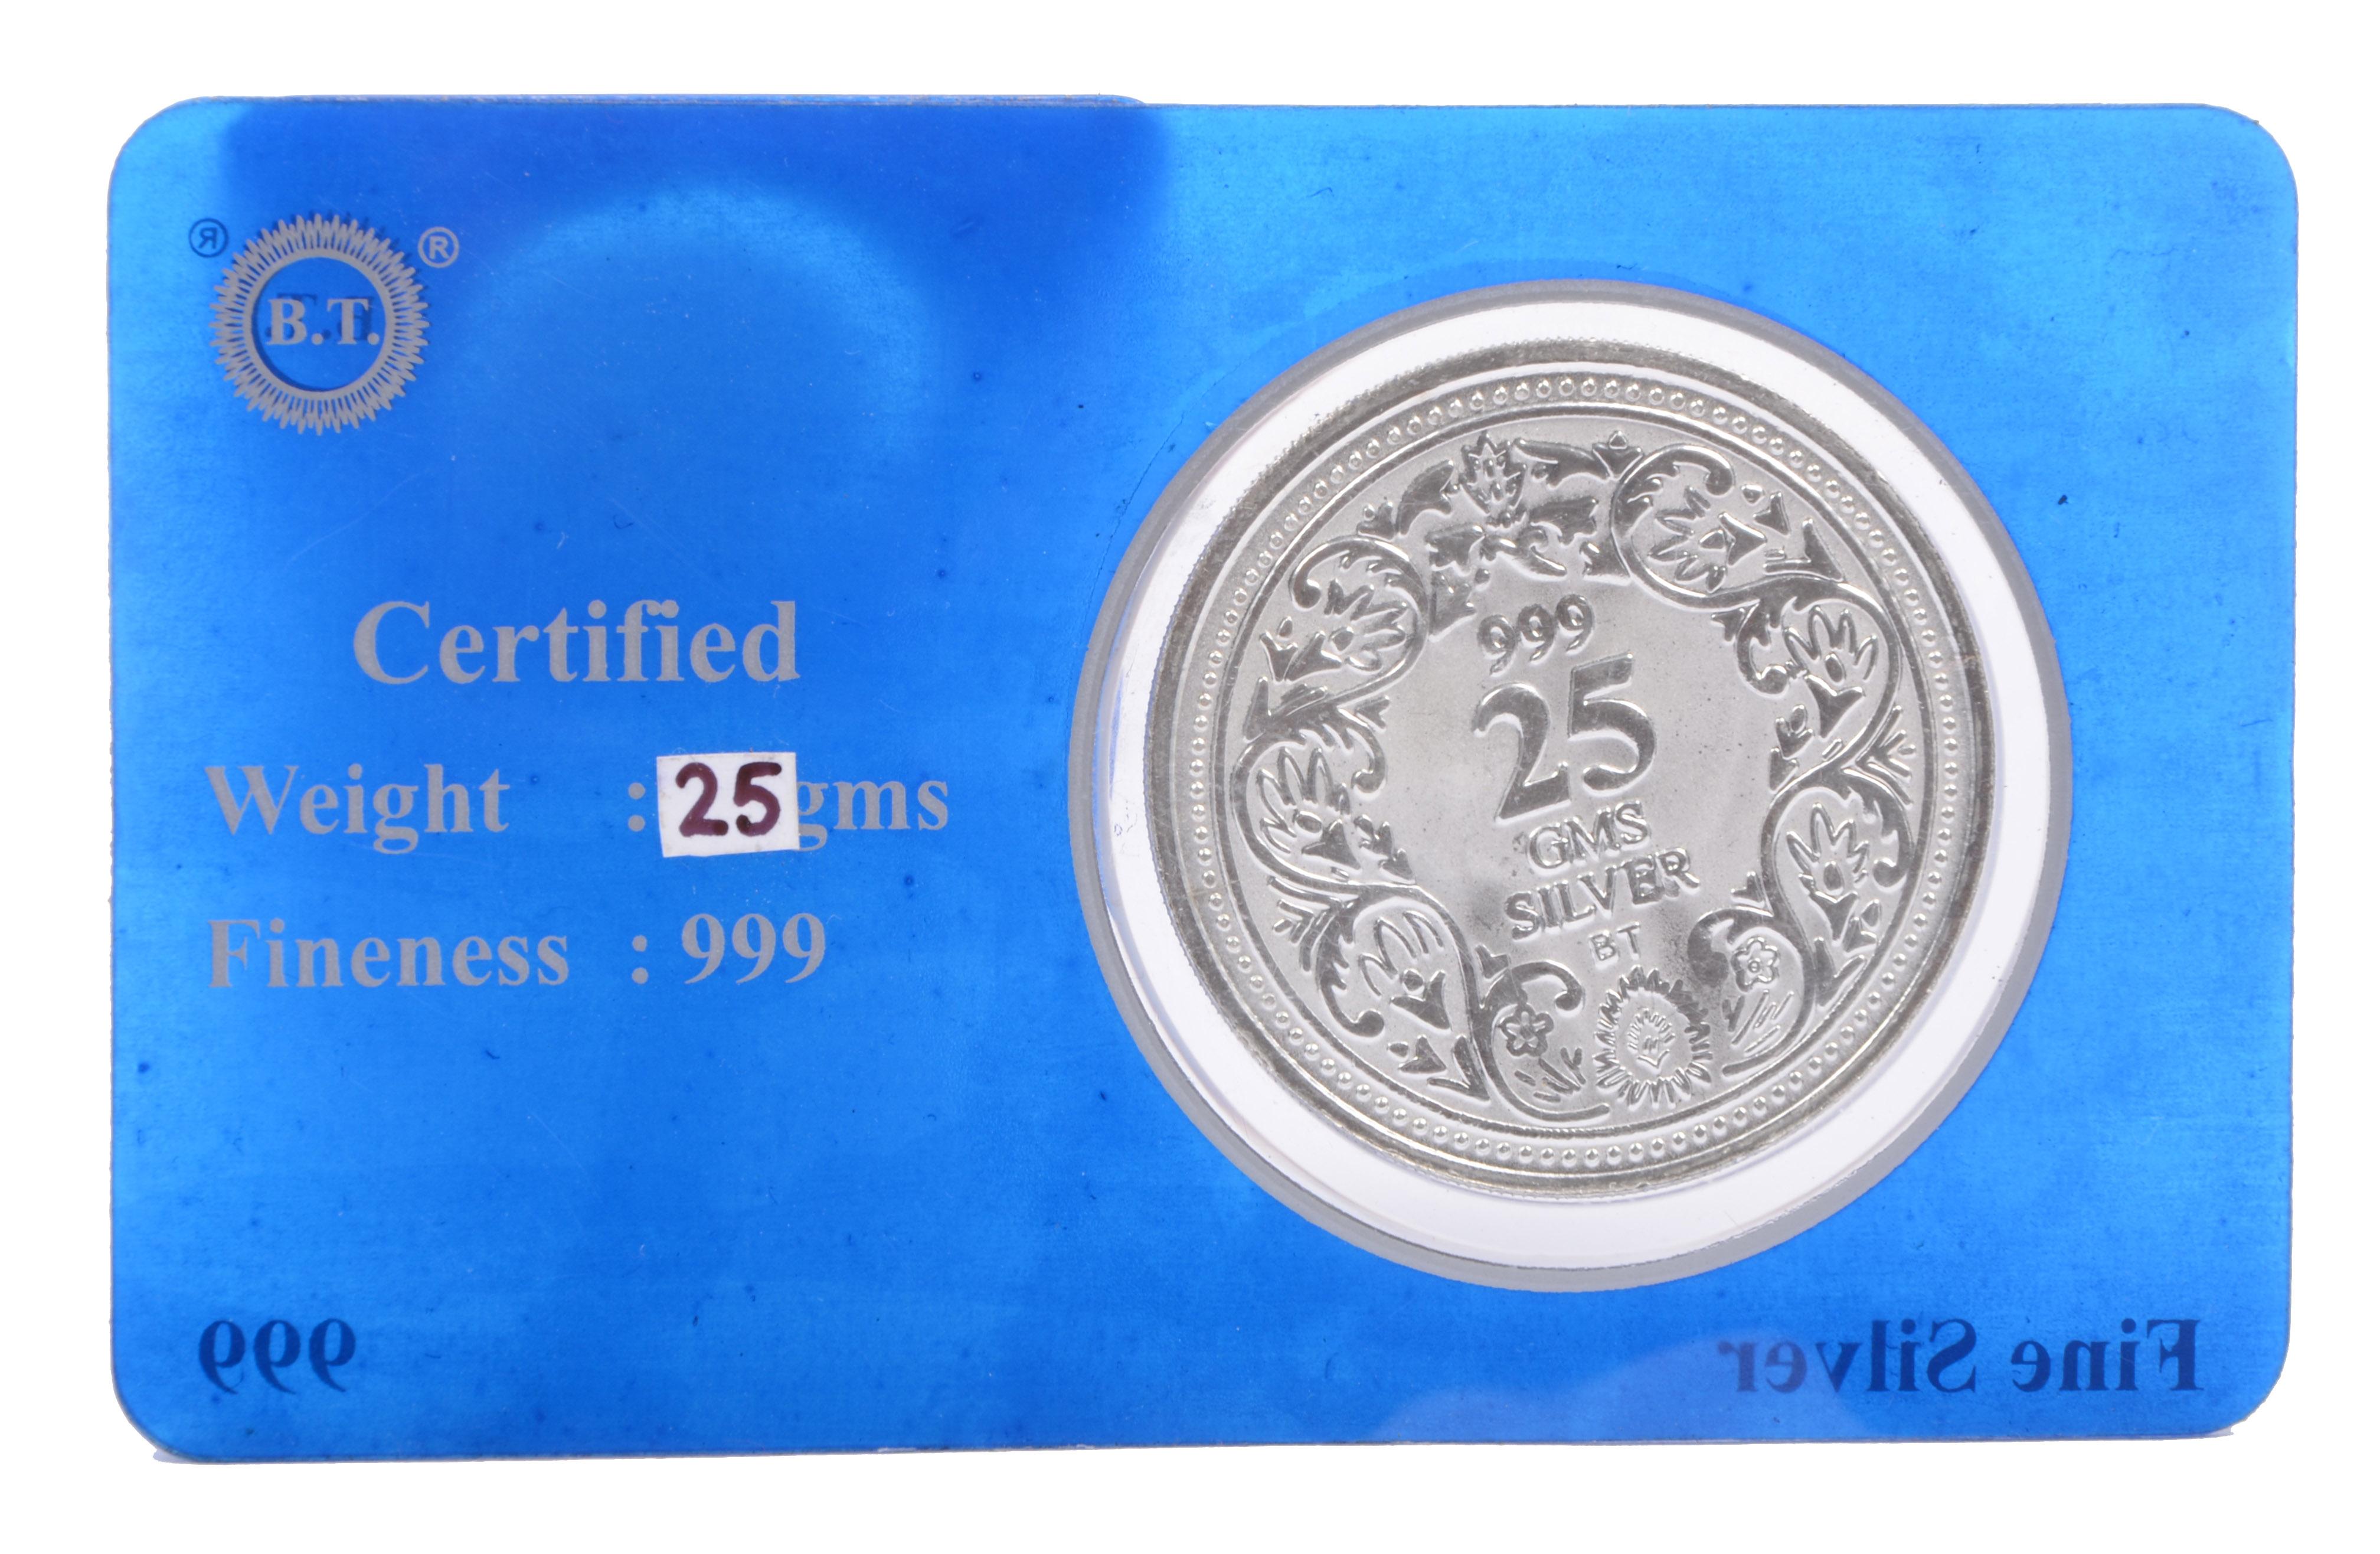 25 GM. SILVER COIN - Aashirwad Jewellers